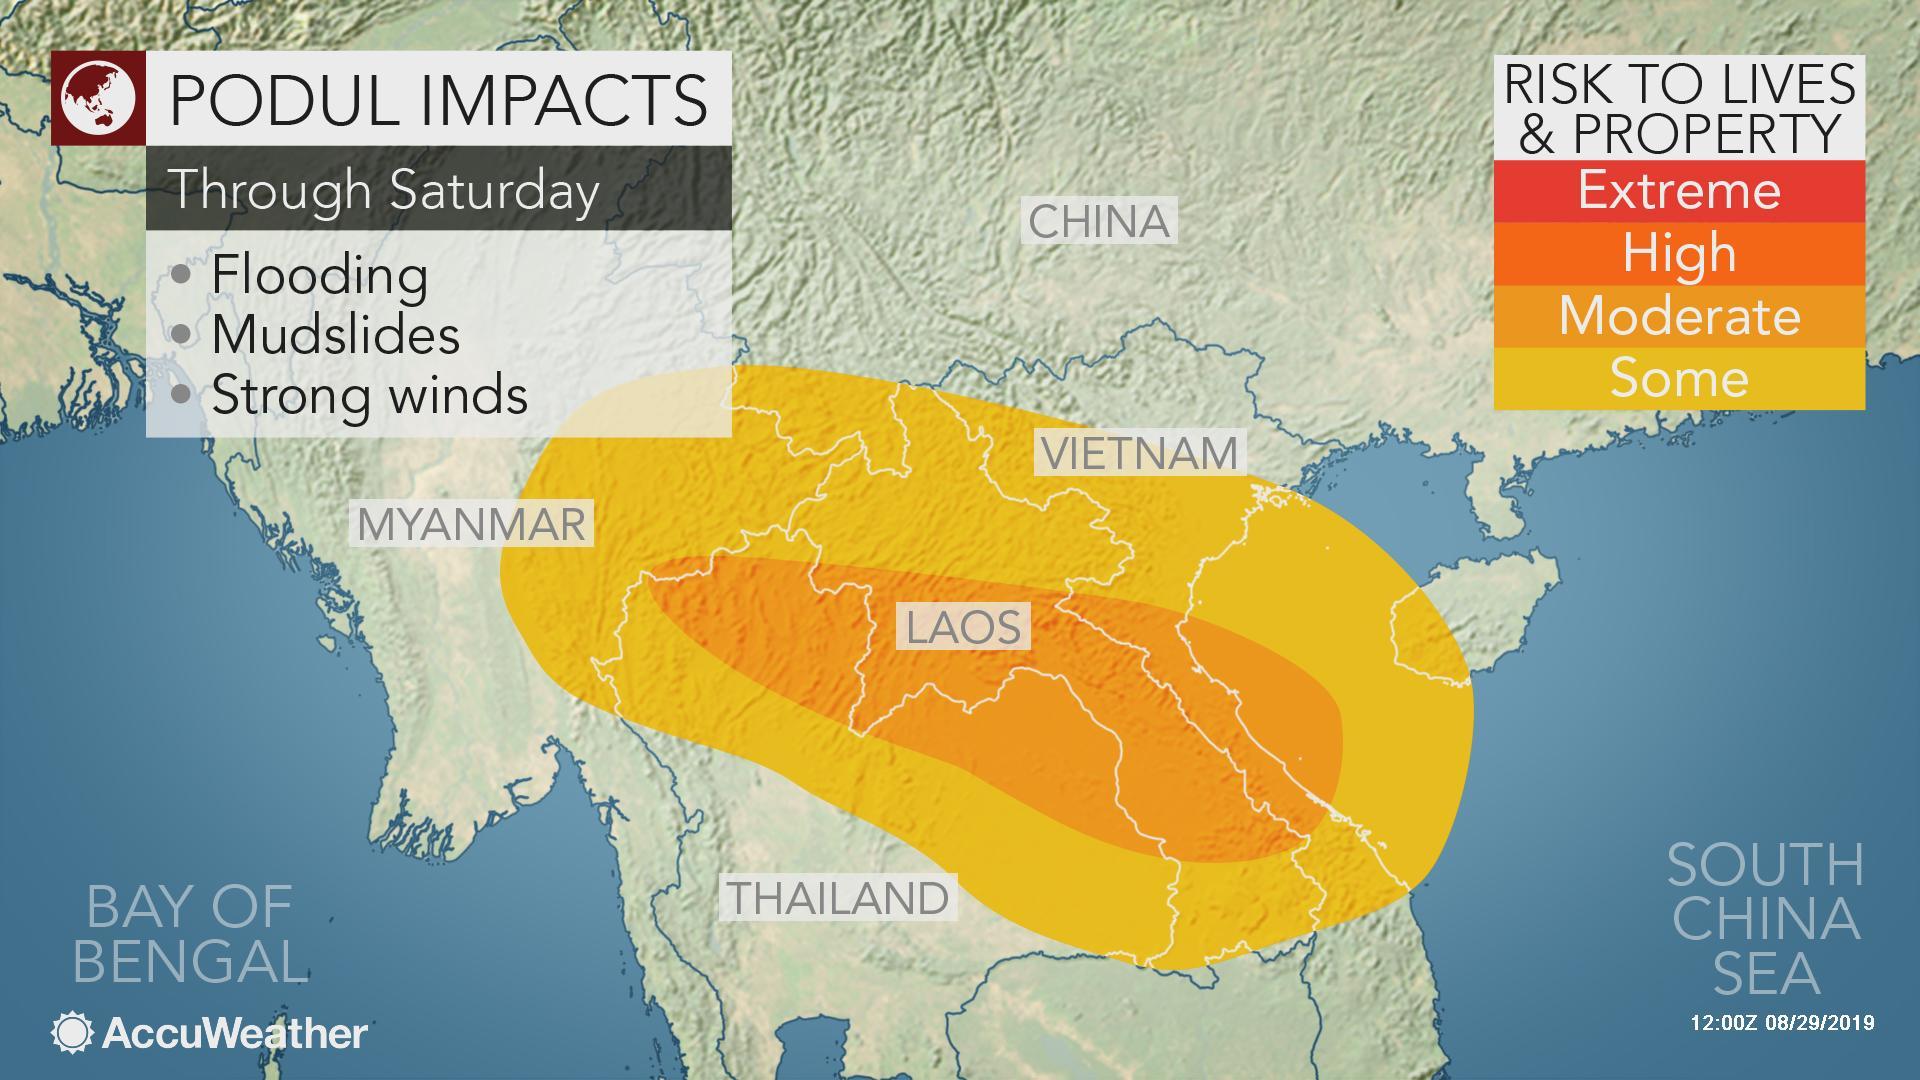 Beijing Weather - AccuWeather Forecast for BJ